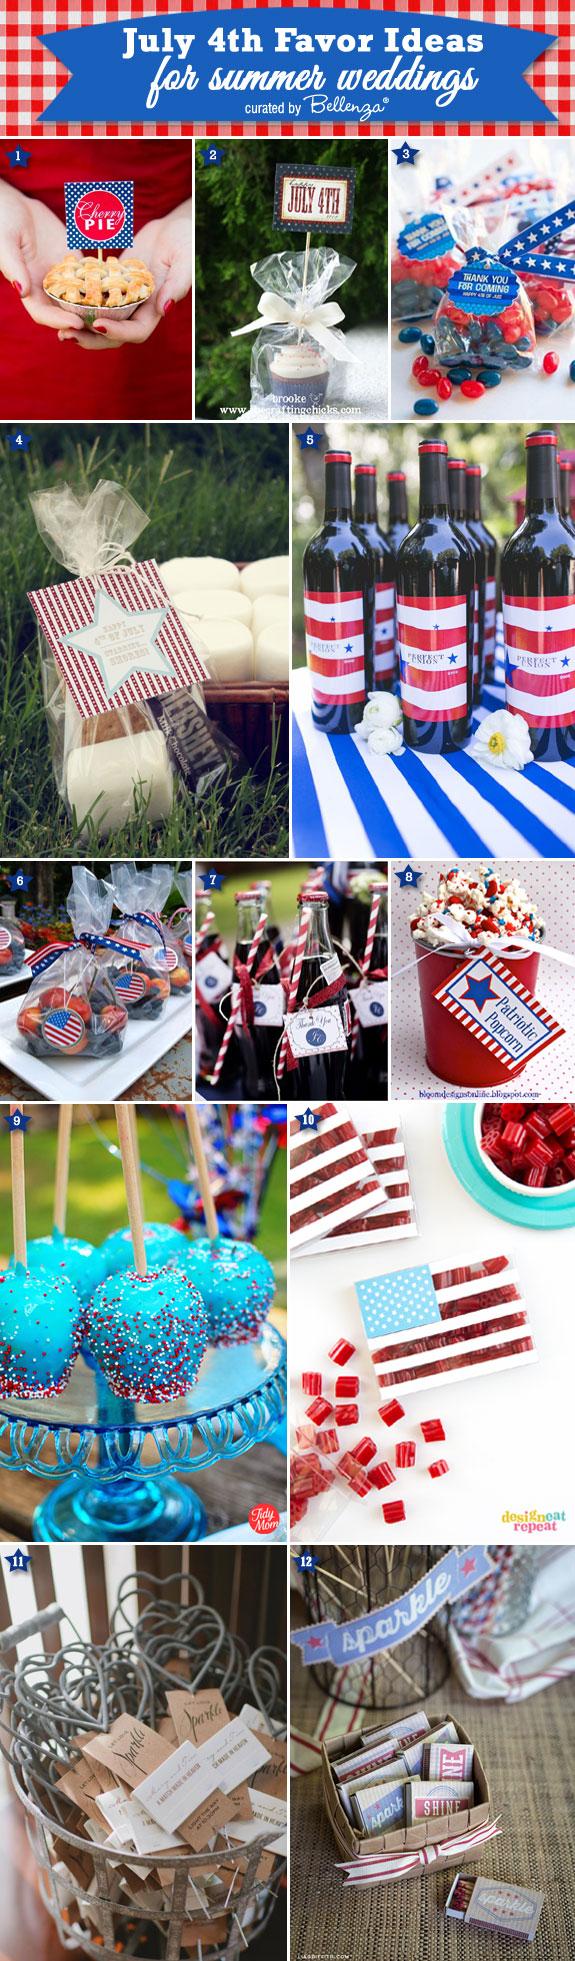 12 Favor Ideas for July 4th Weddings! #july4weddingfavors #july4partyfavors